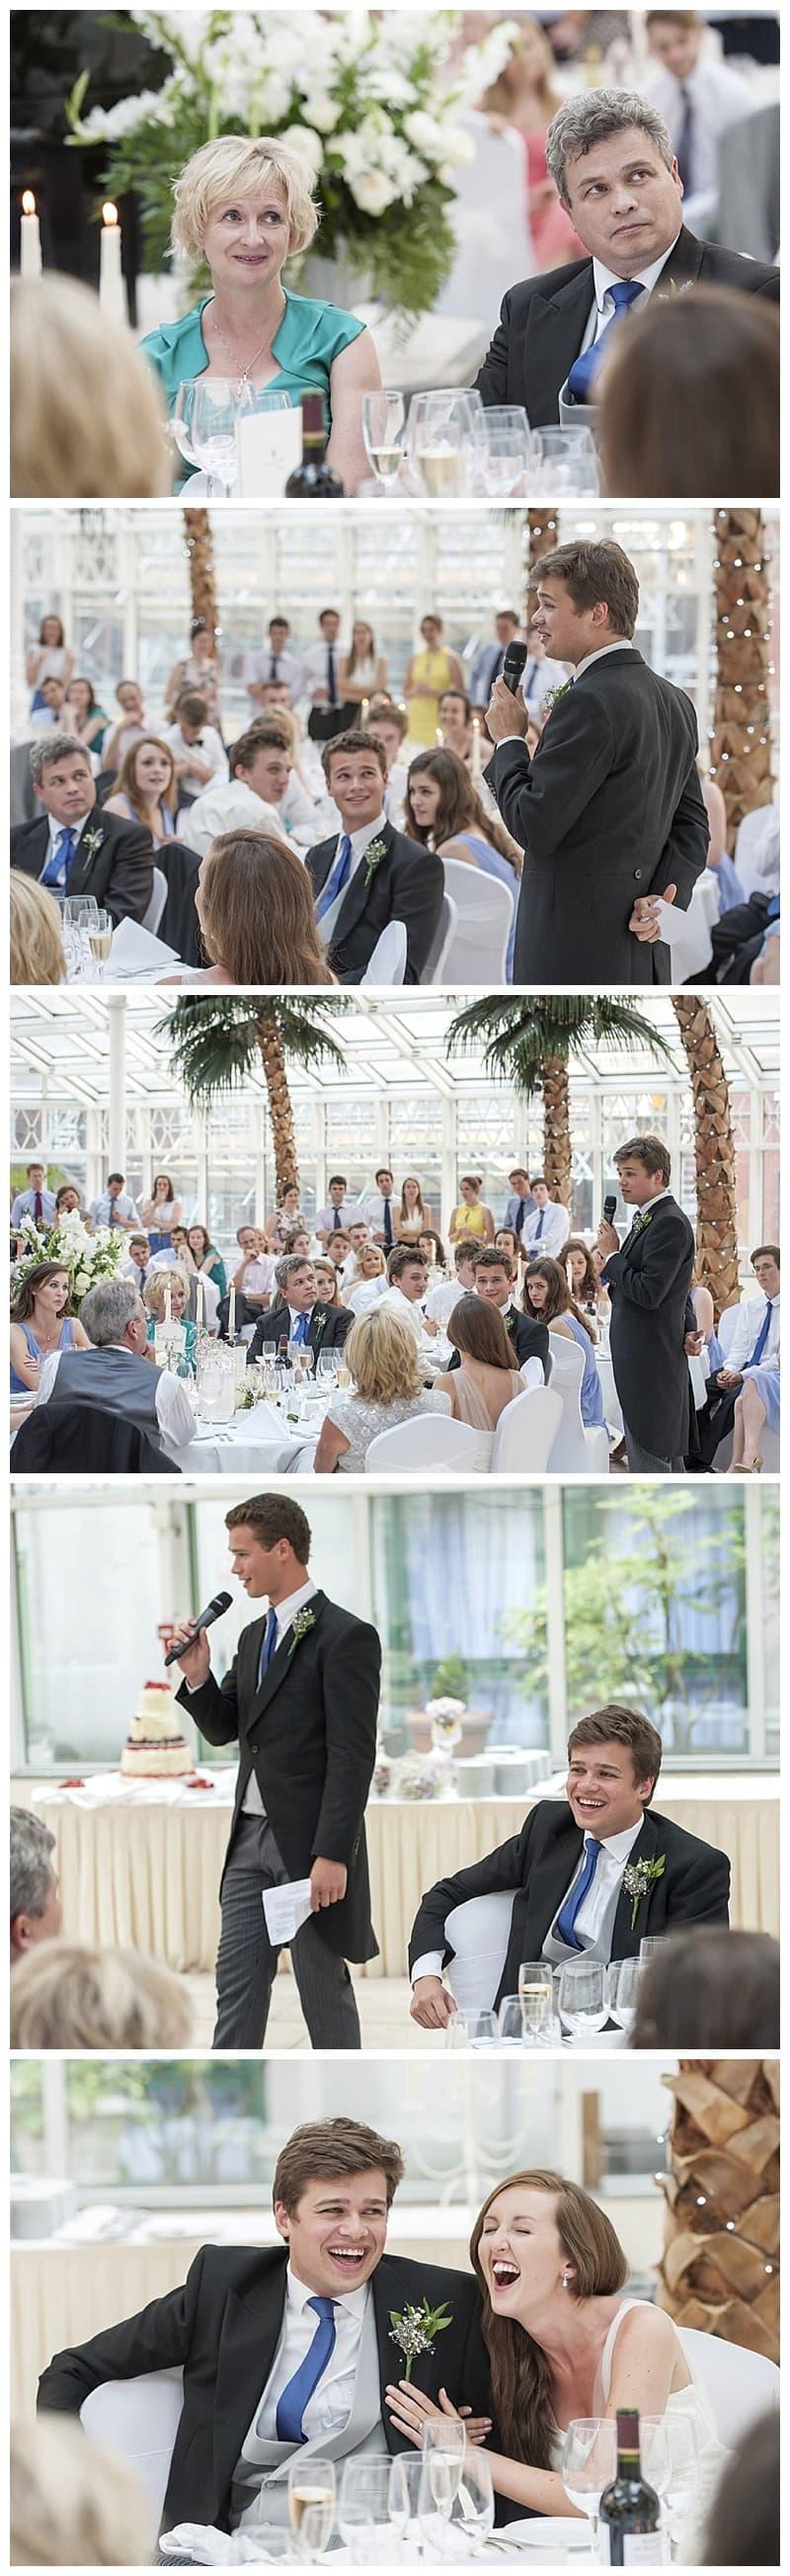 Dan & Rachel, Hyde Park, Kensington Wedding, Benjamin Wetherall Photography0043